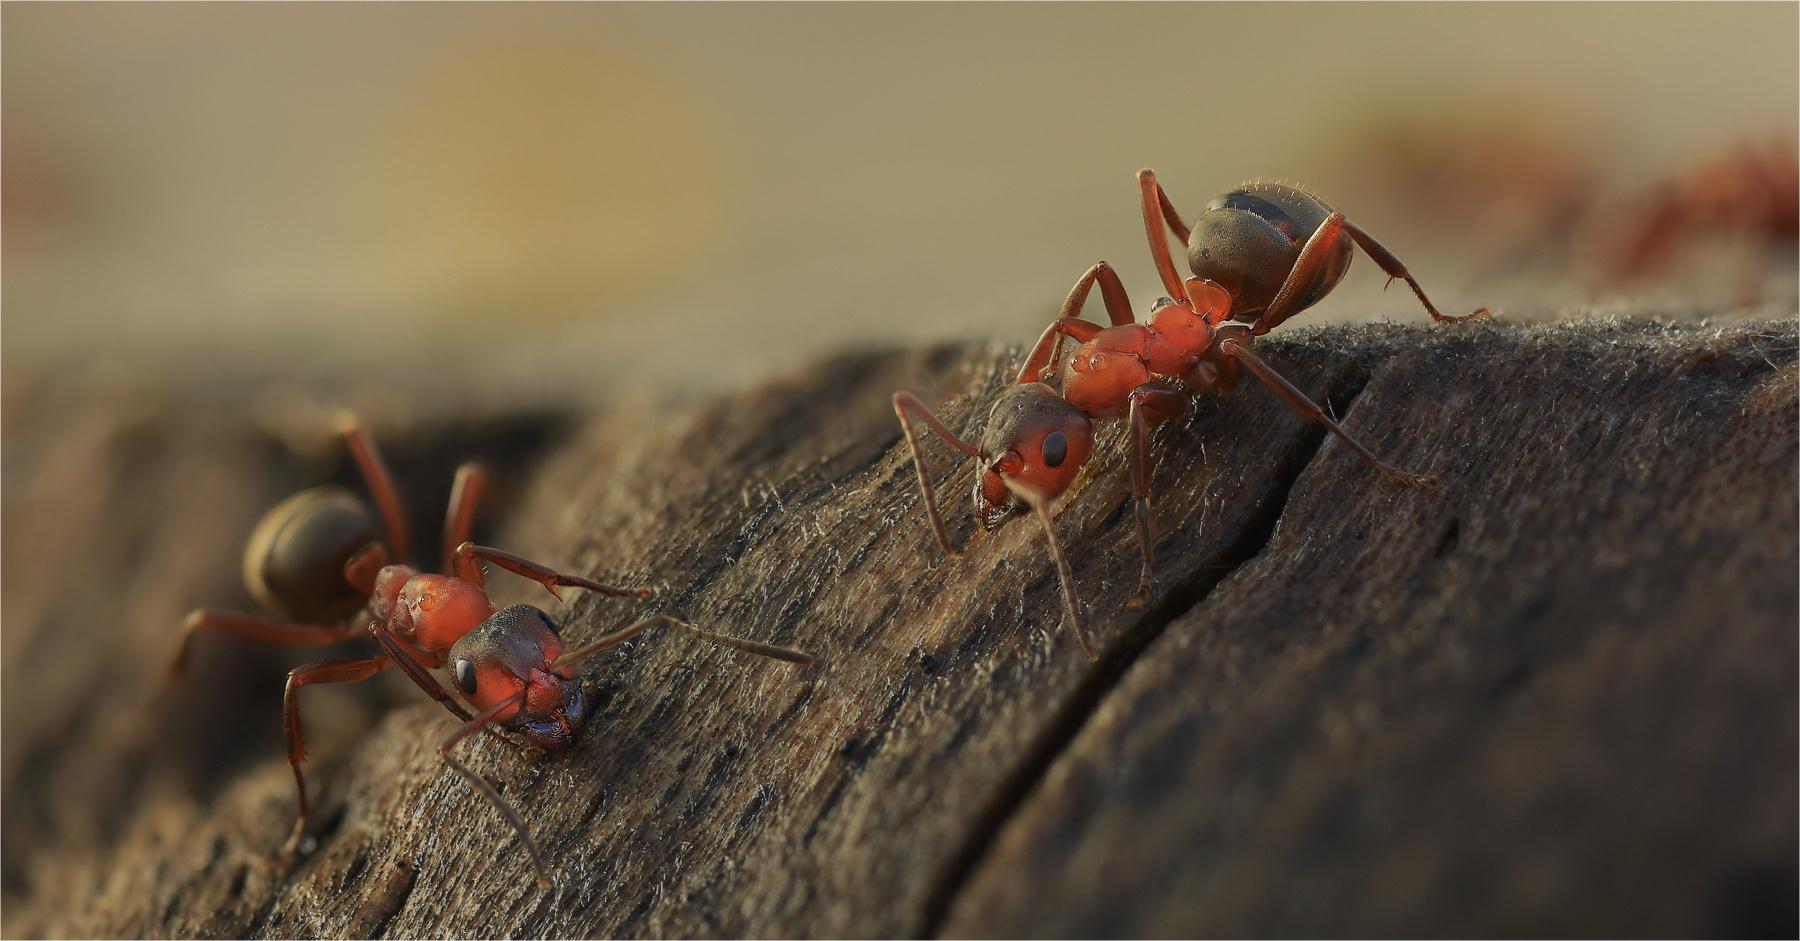 Ants...three